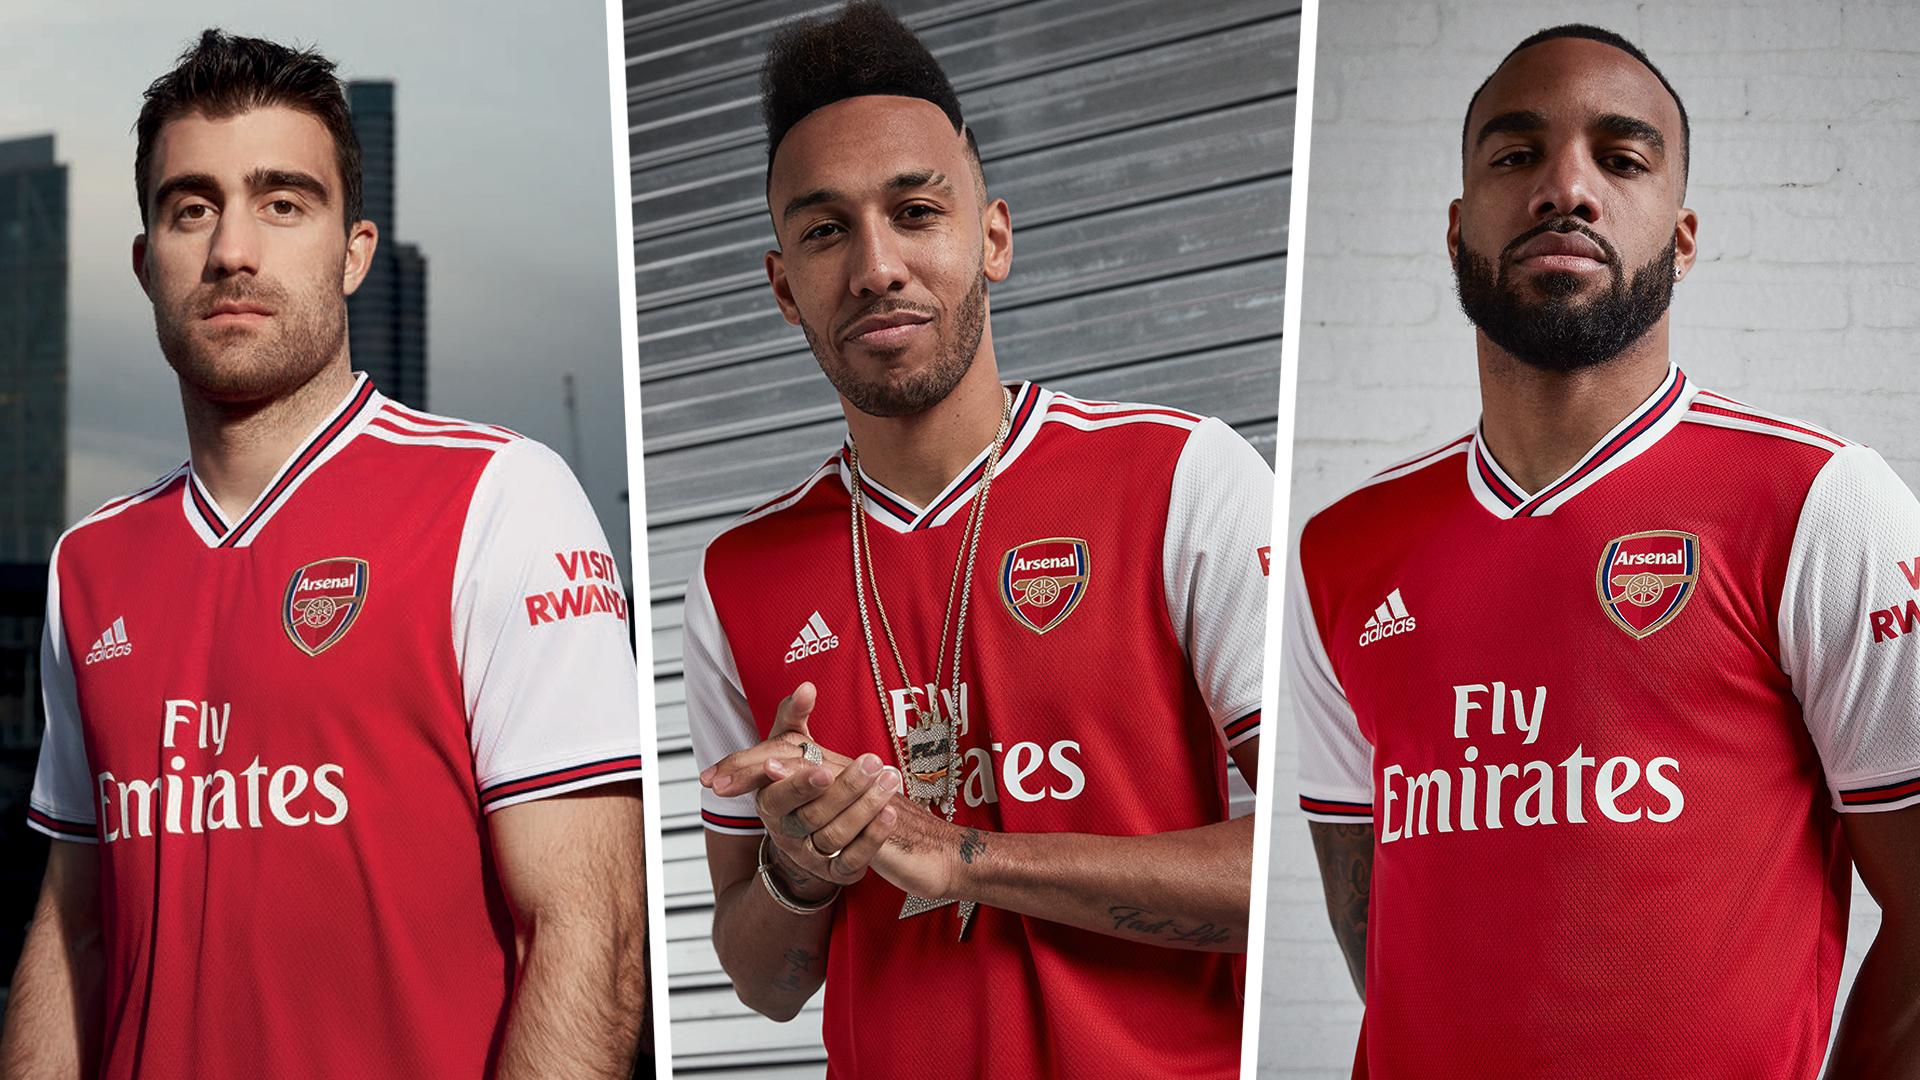 Arsenal kit 2019-20 Sokratis Pierre-Emerick Aubameyang Alexandre Lacazette